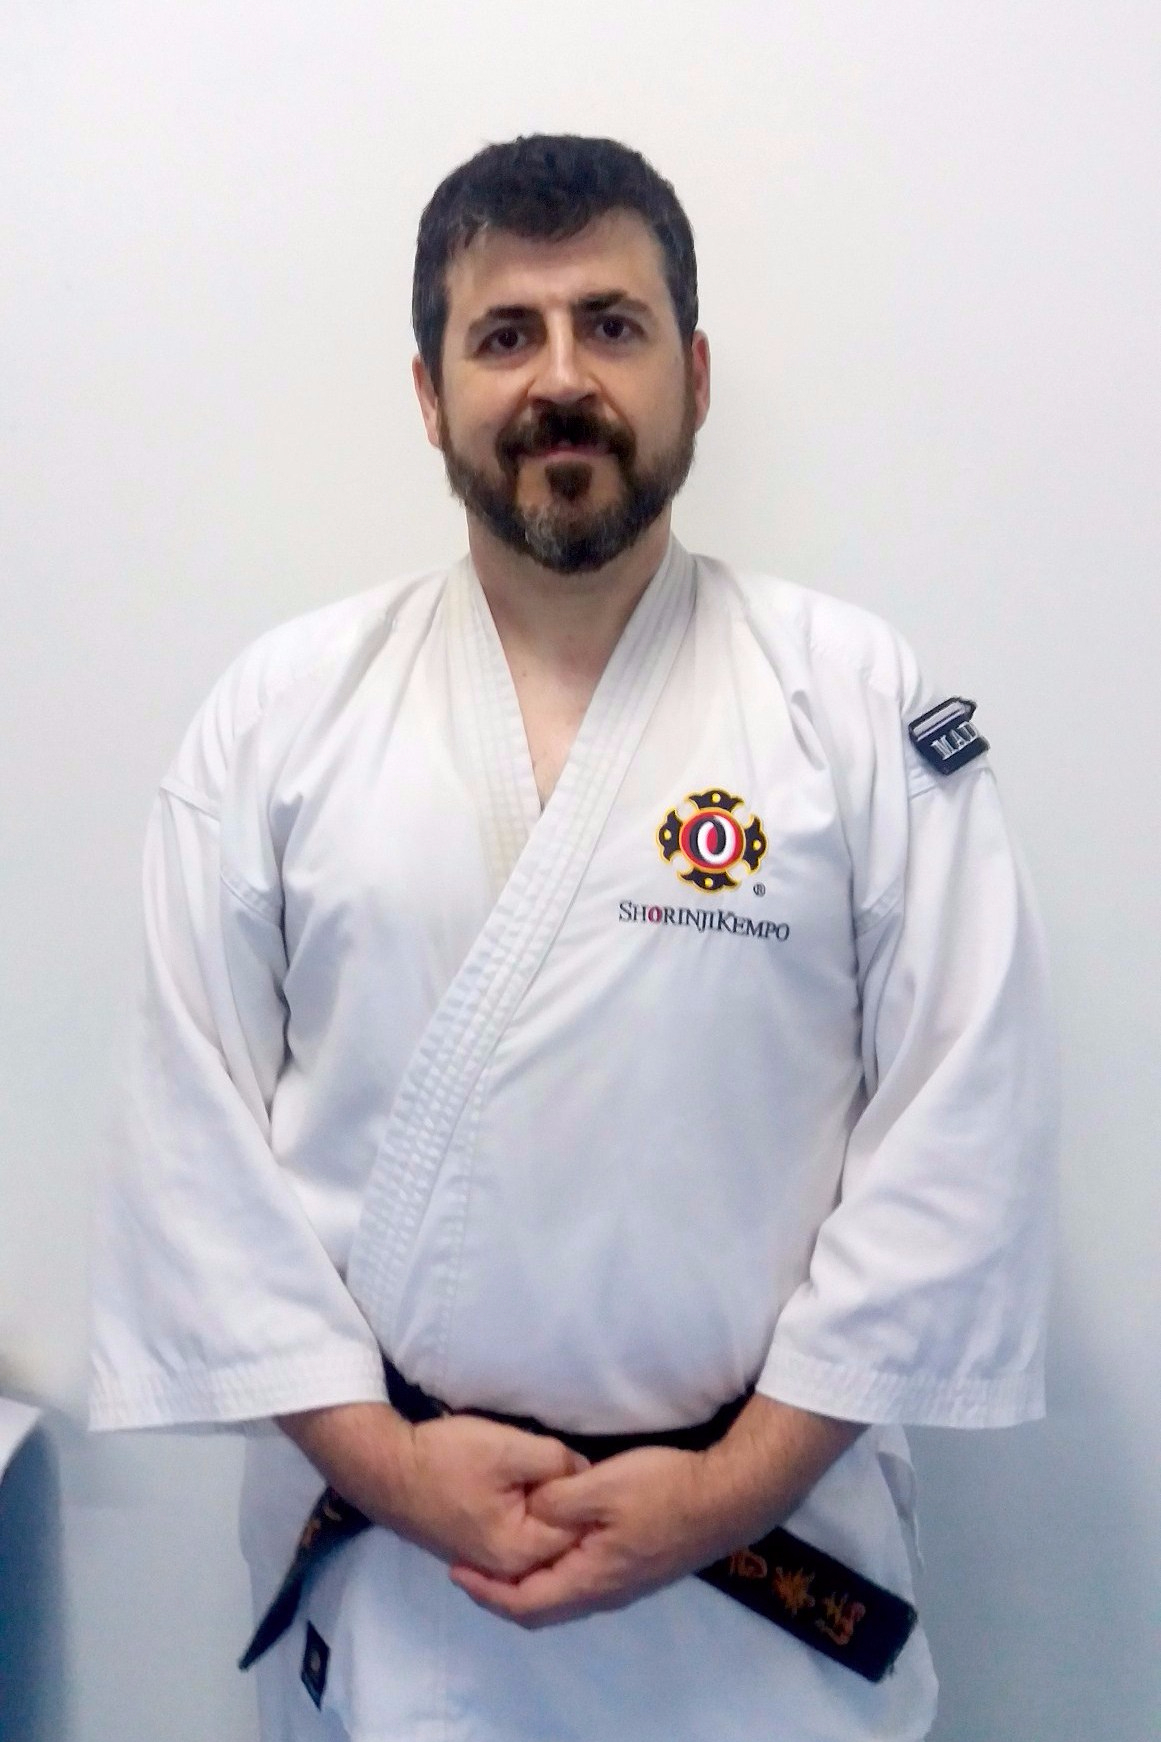 Oscar Sánchez Martínez